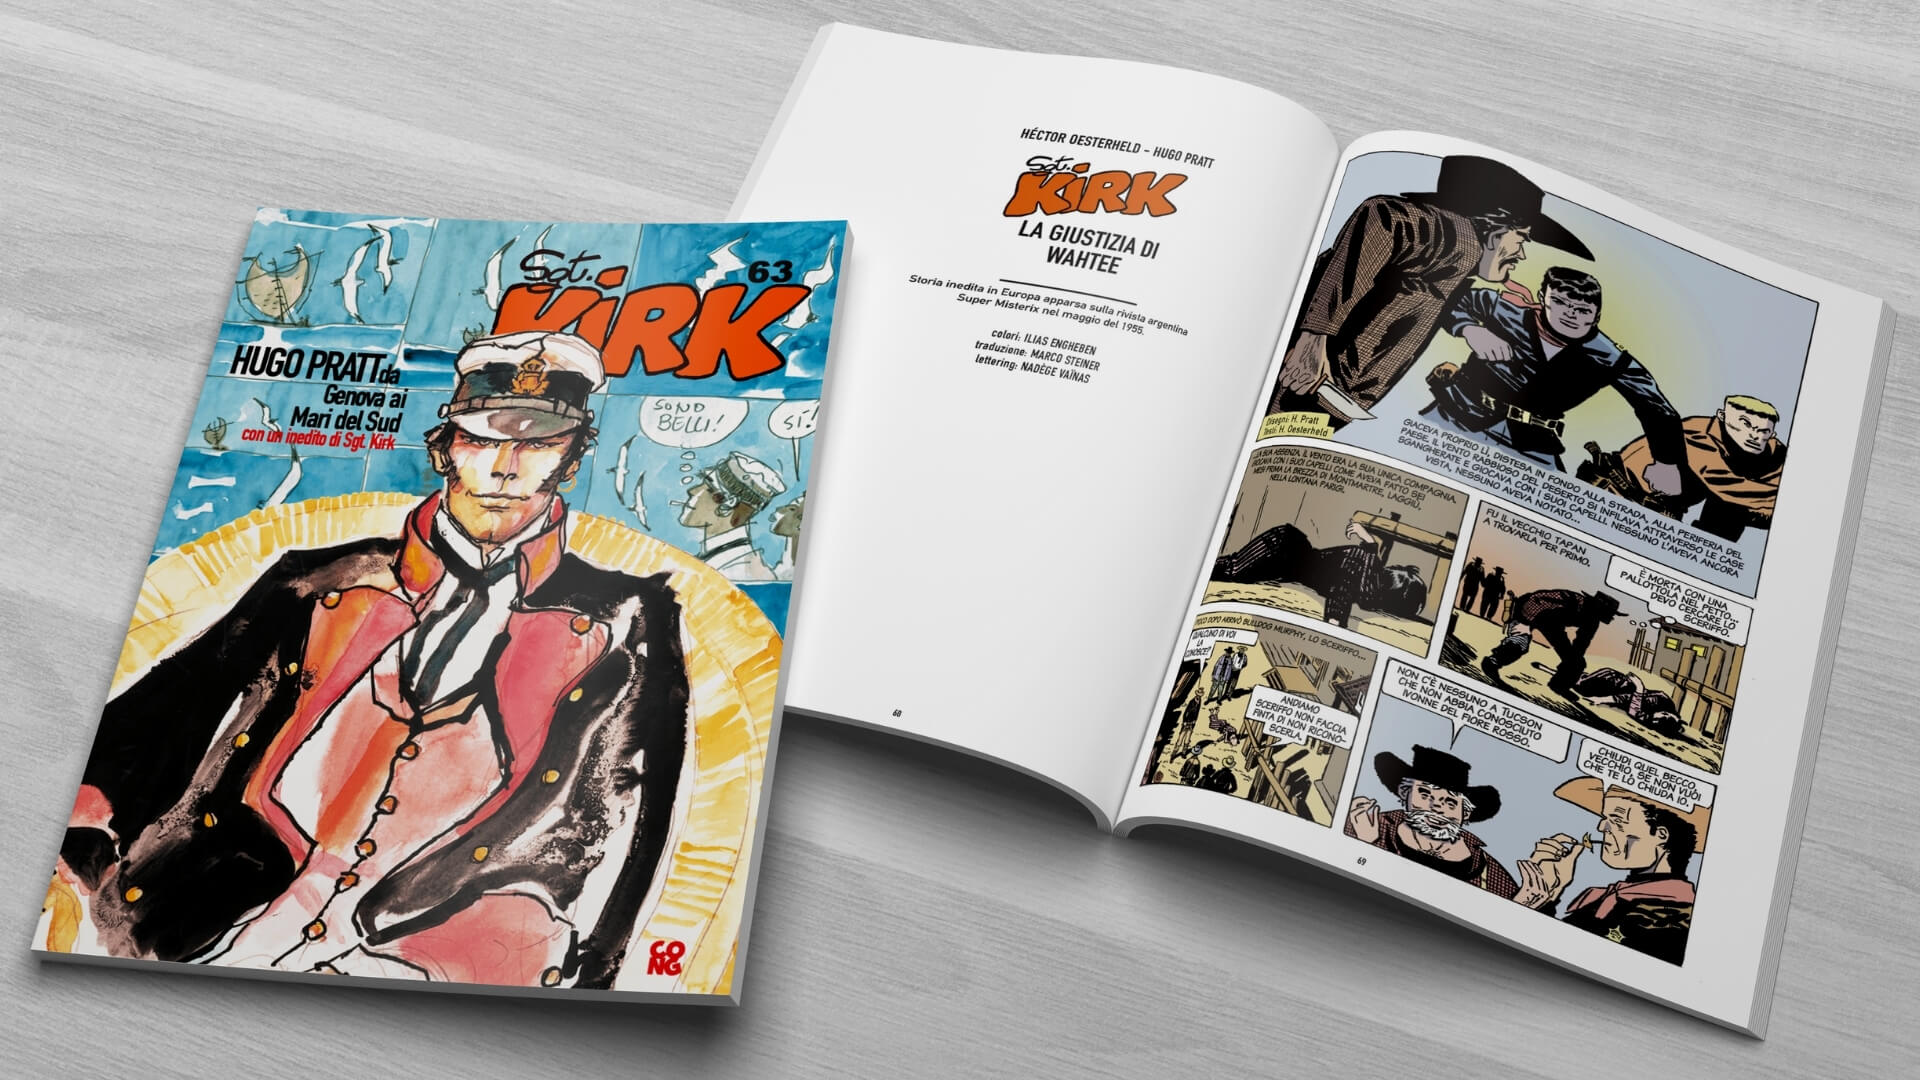 Sgt. Kirk catalogo